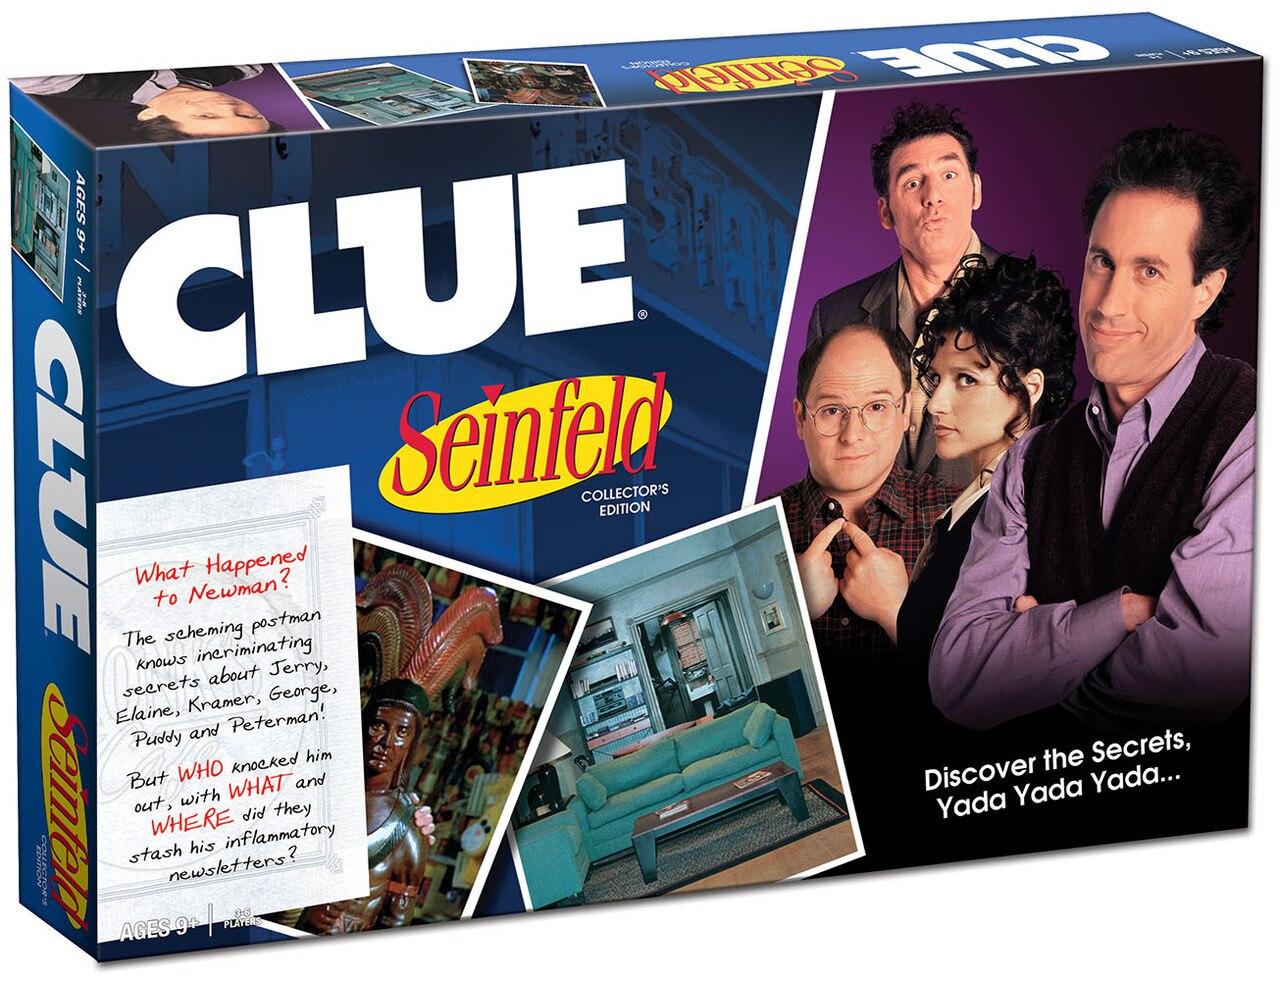 Clue: Seinfeld